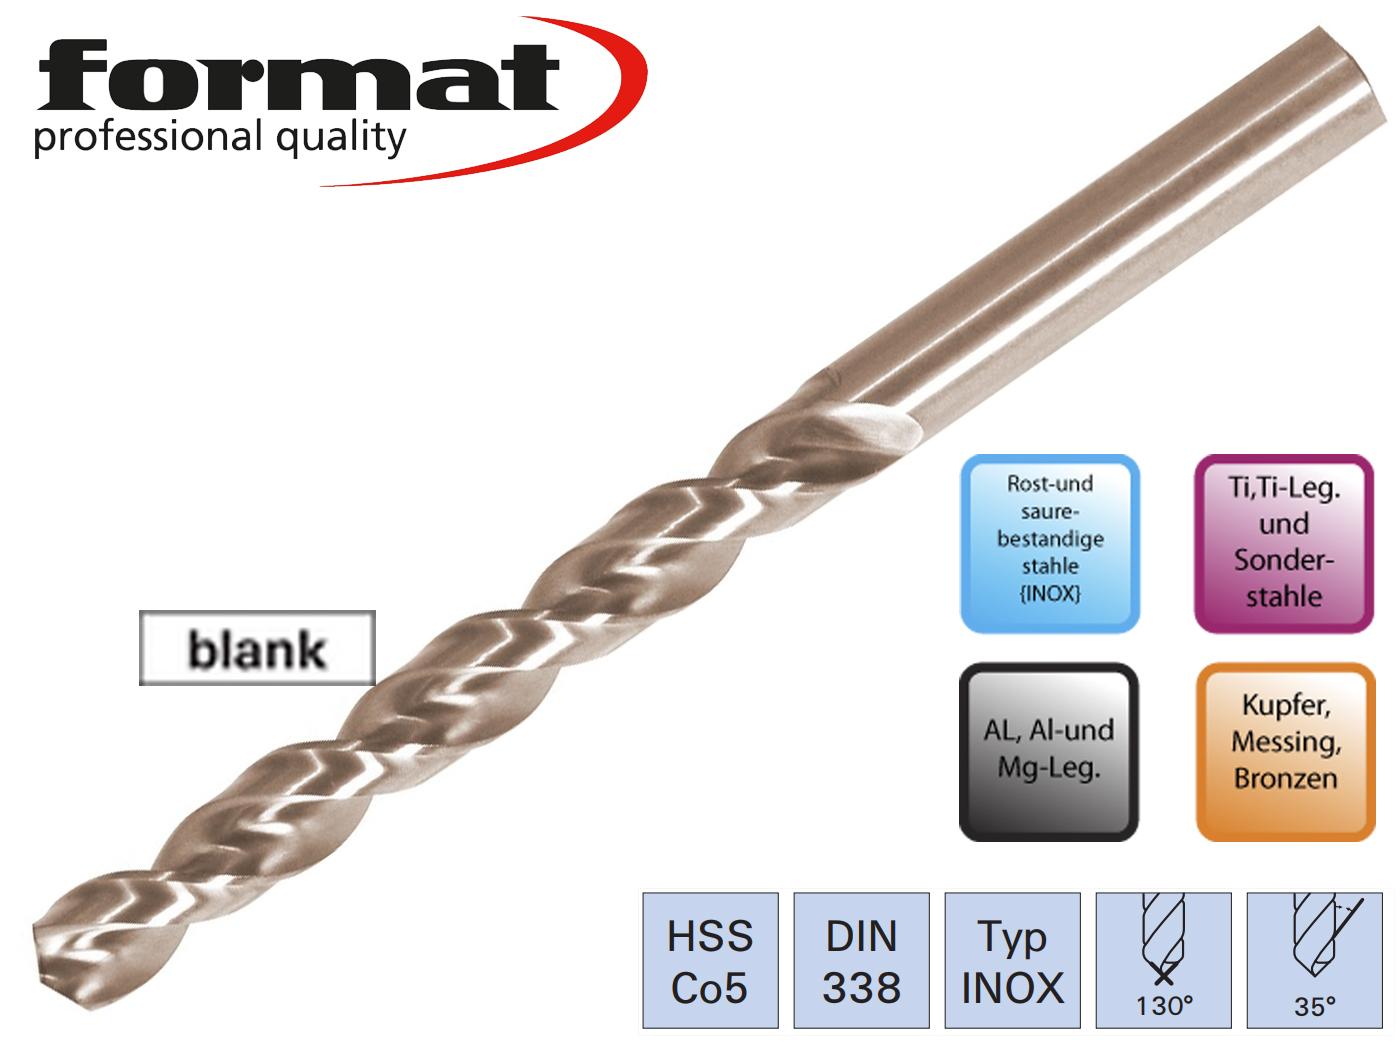 Spiraalborenset DIN 338 TF HSSCo5 FORMAT | DKMTools - DKM Tools